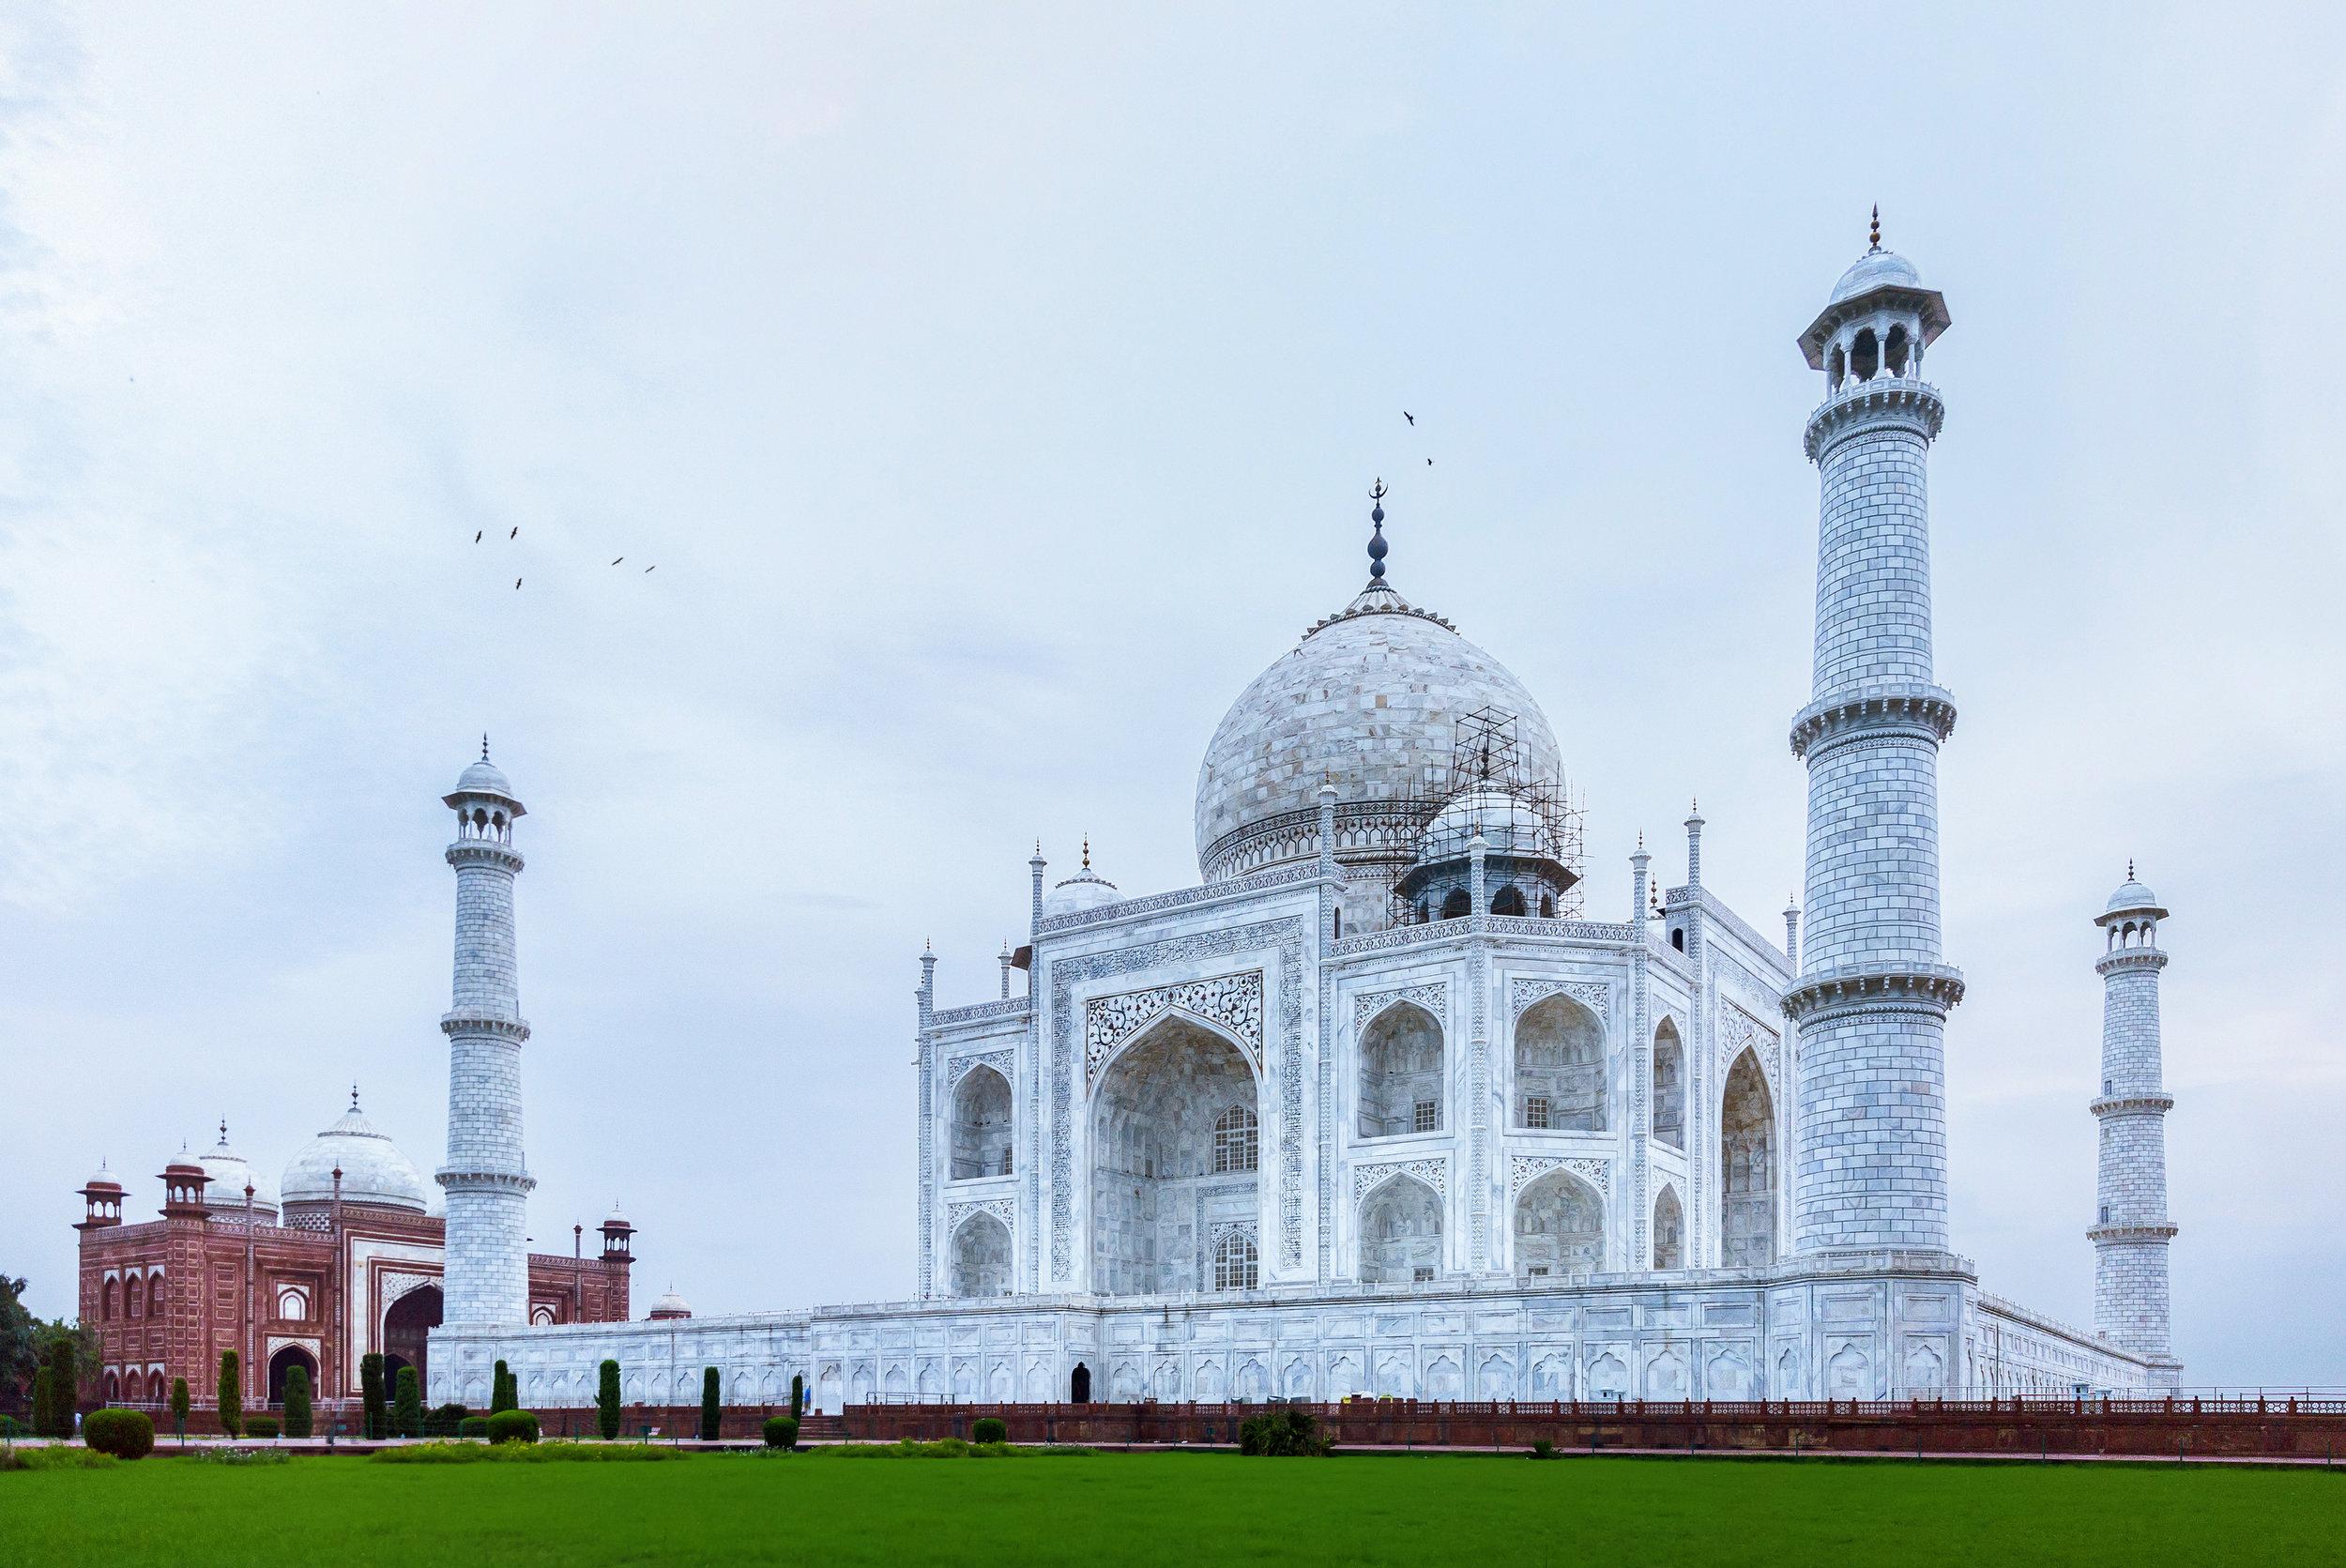 India_TajMahal_01.2.jpg